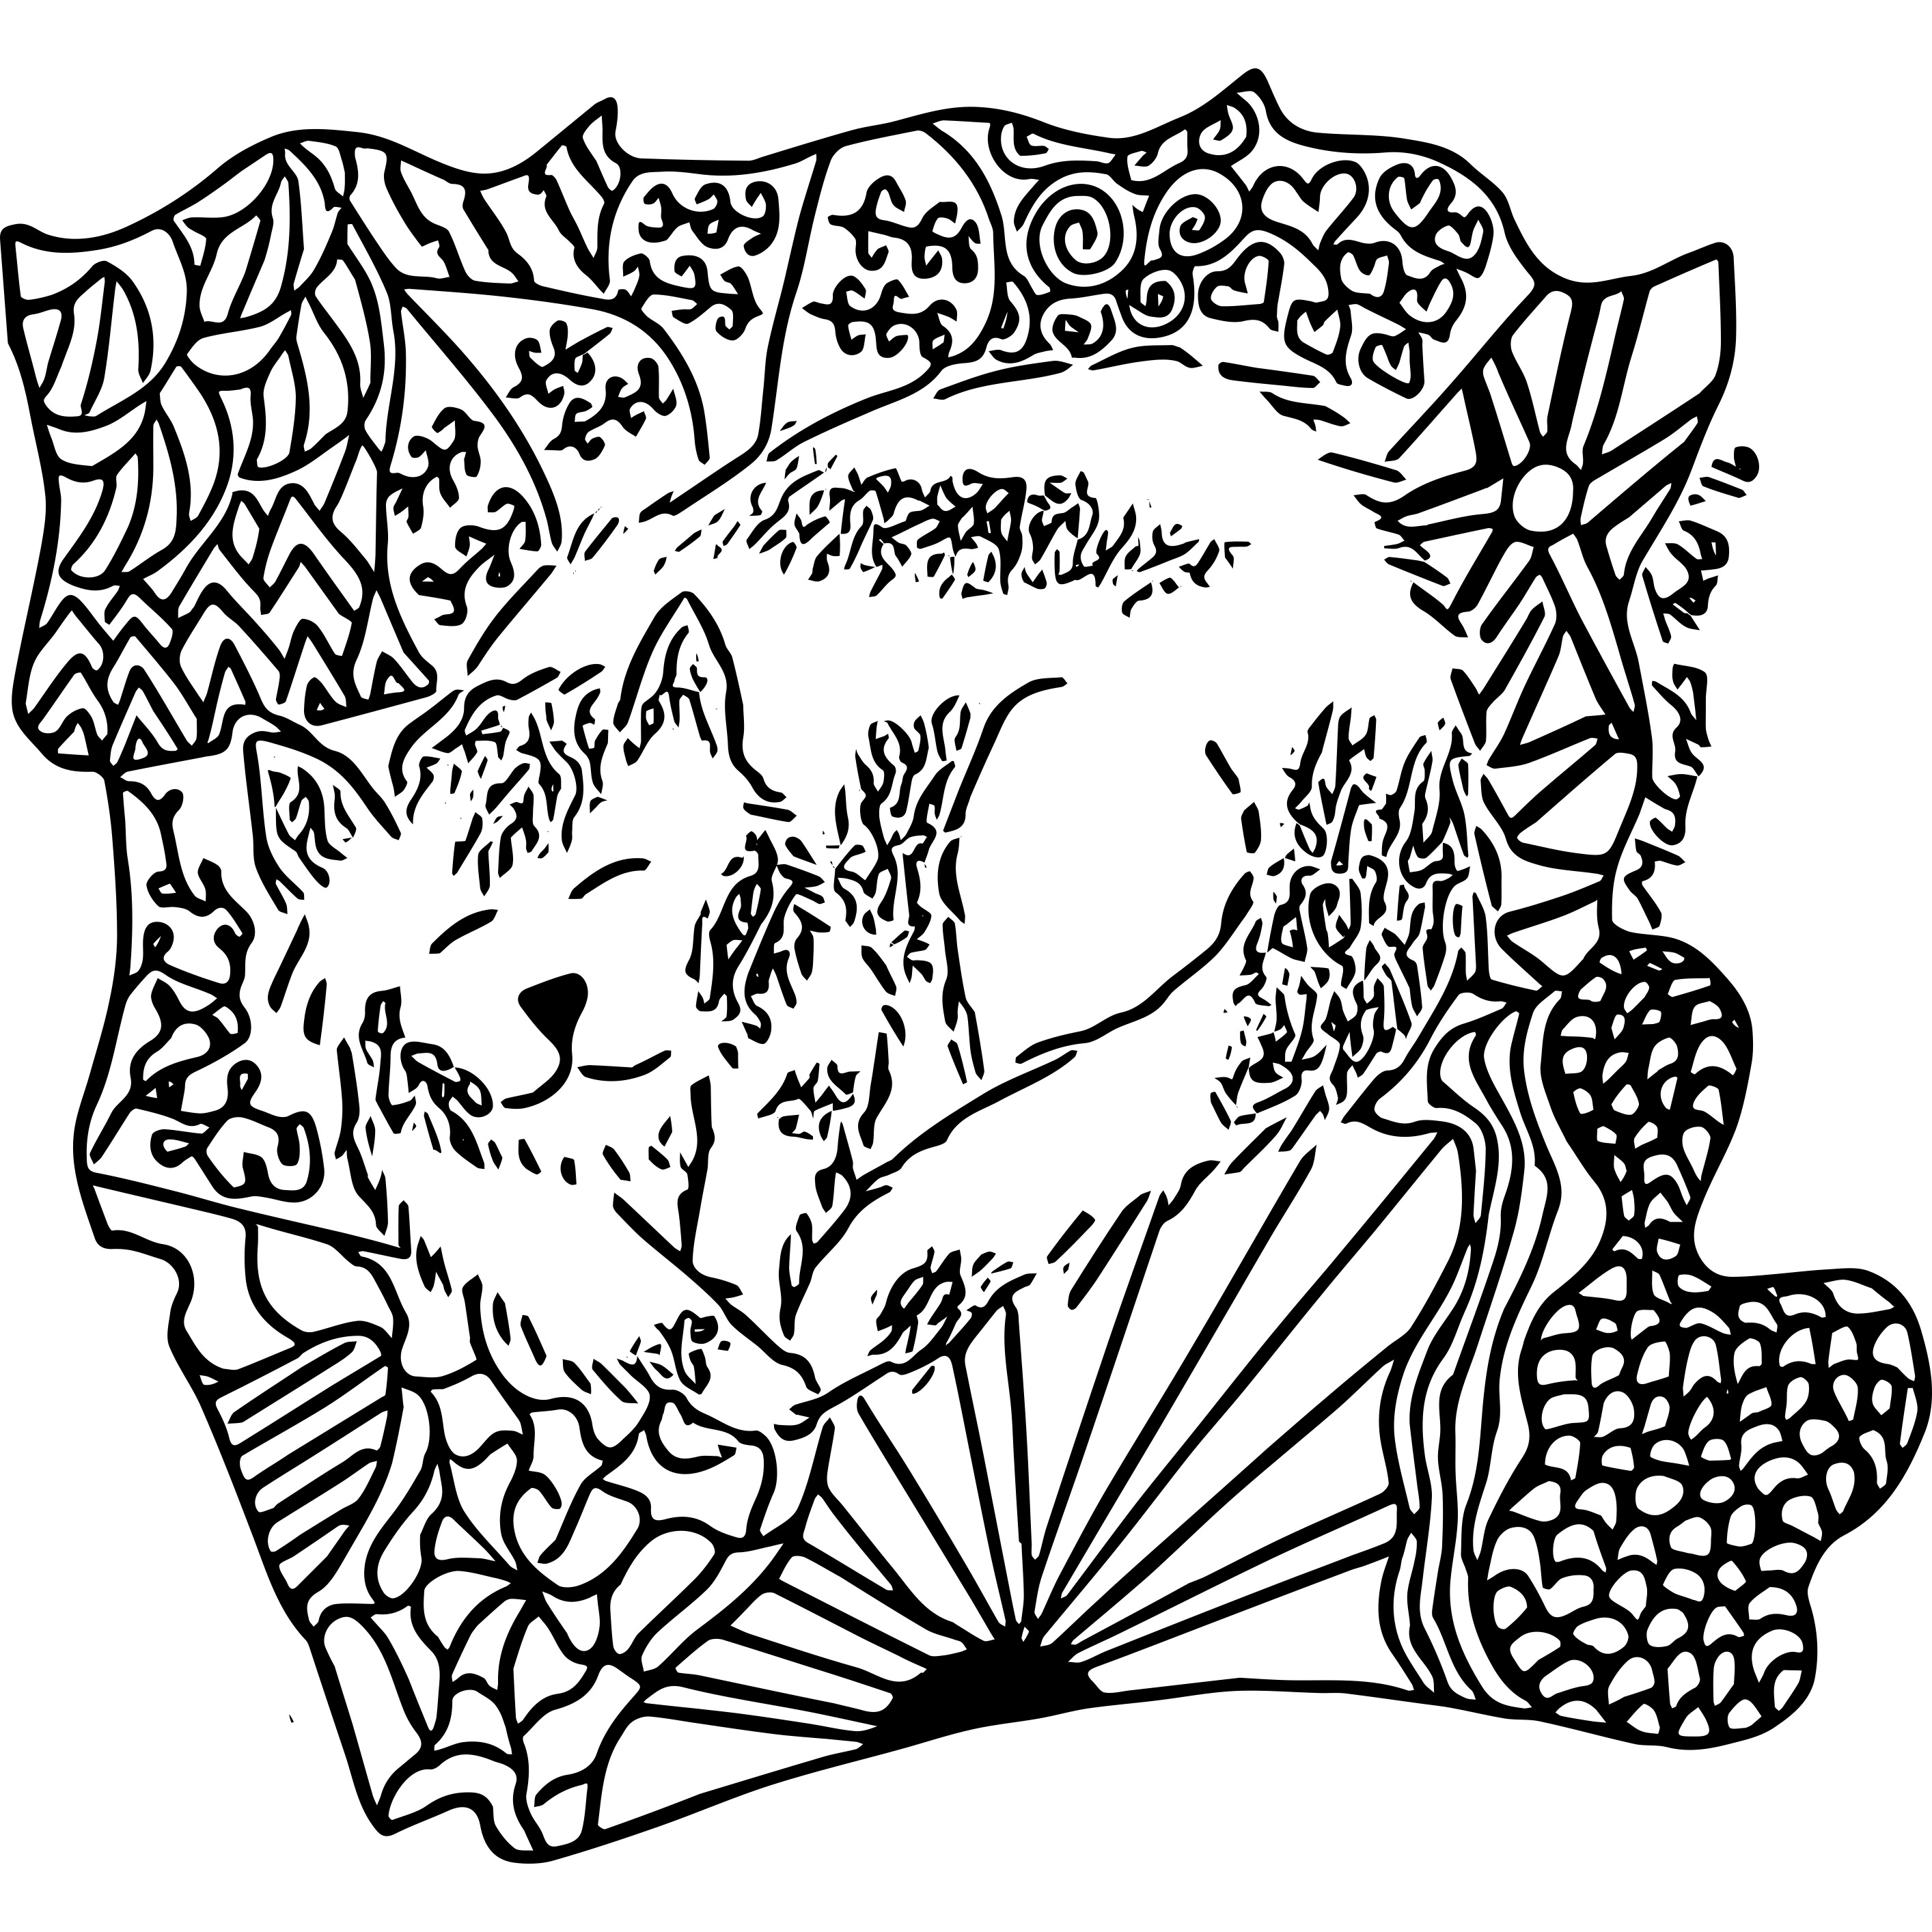 kitten coloring page mel u0027s doodle designs